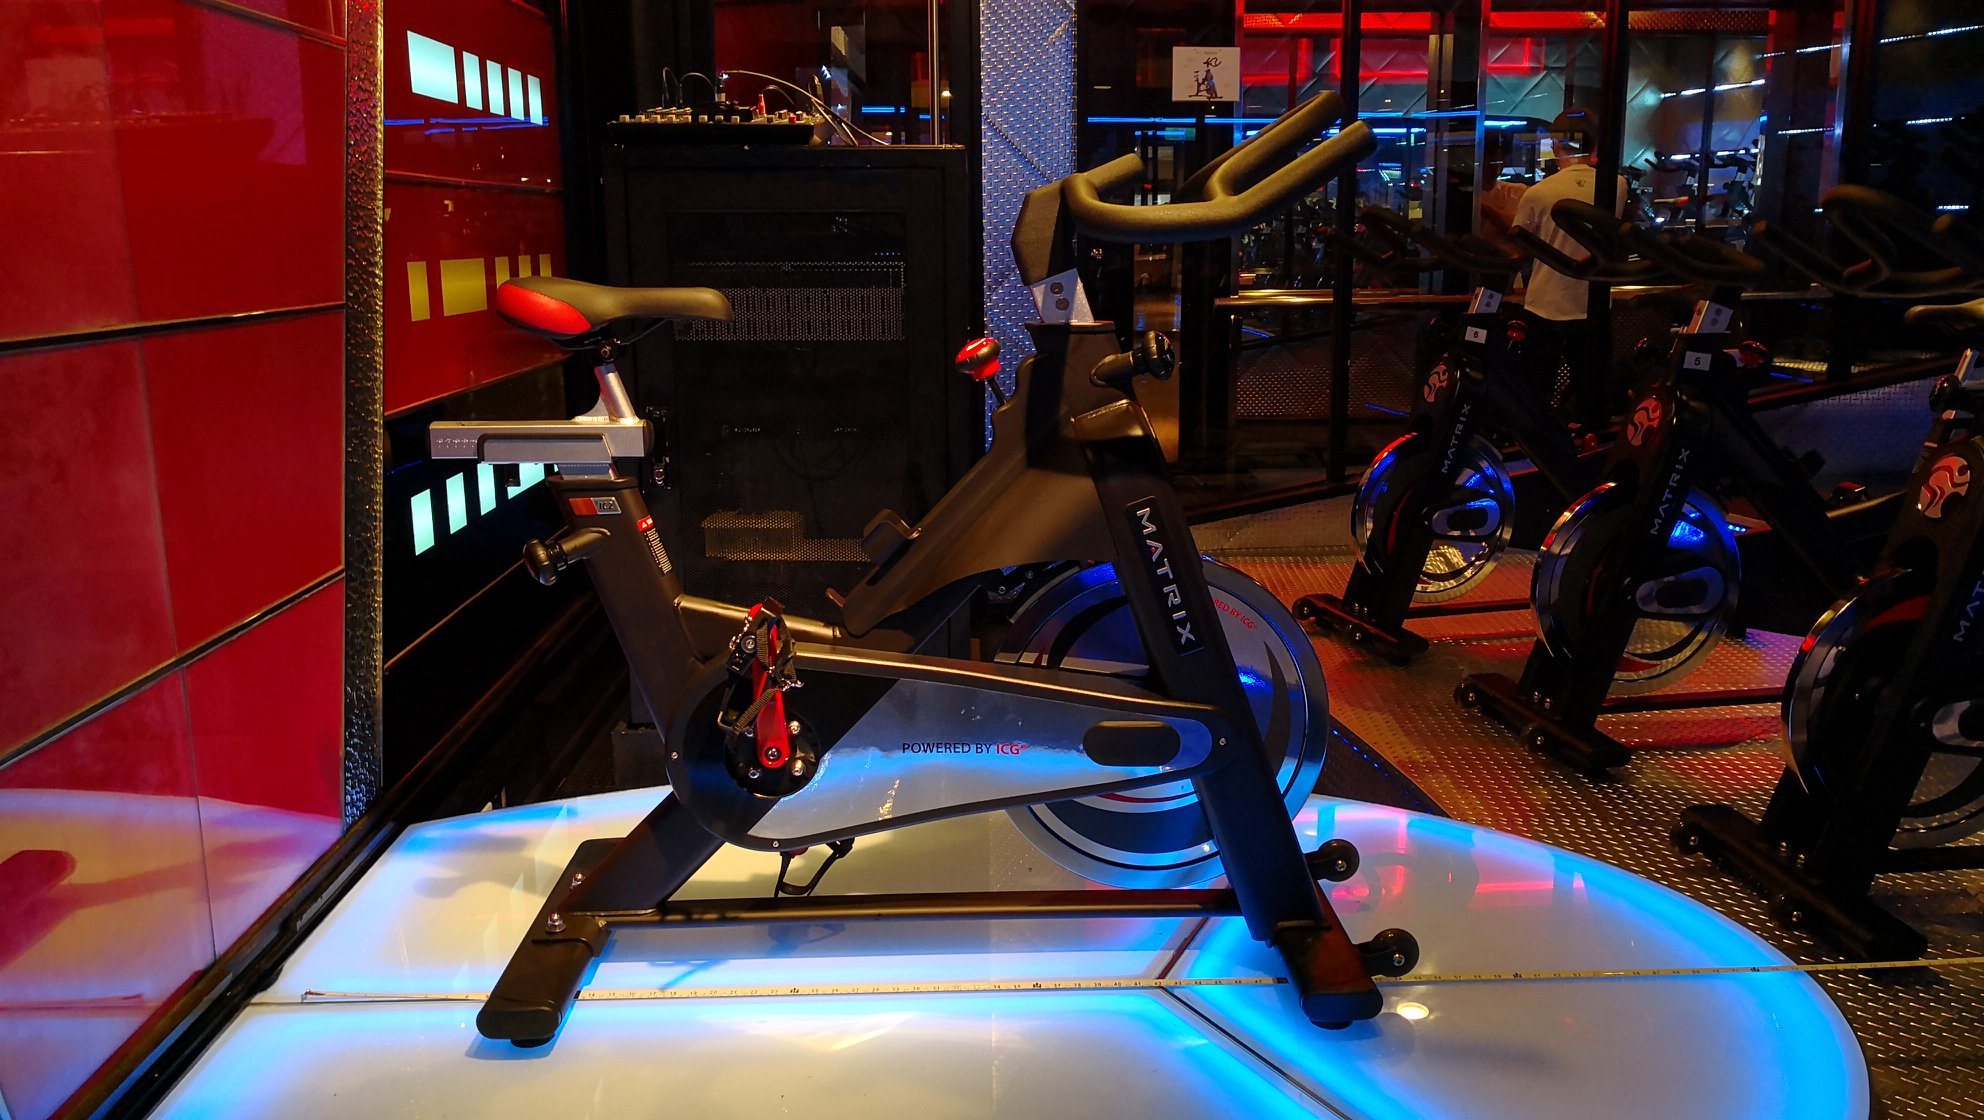 exercise-world-gym-1.jpg